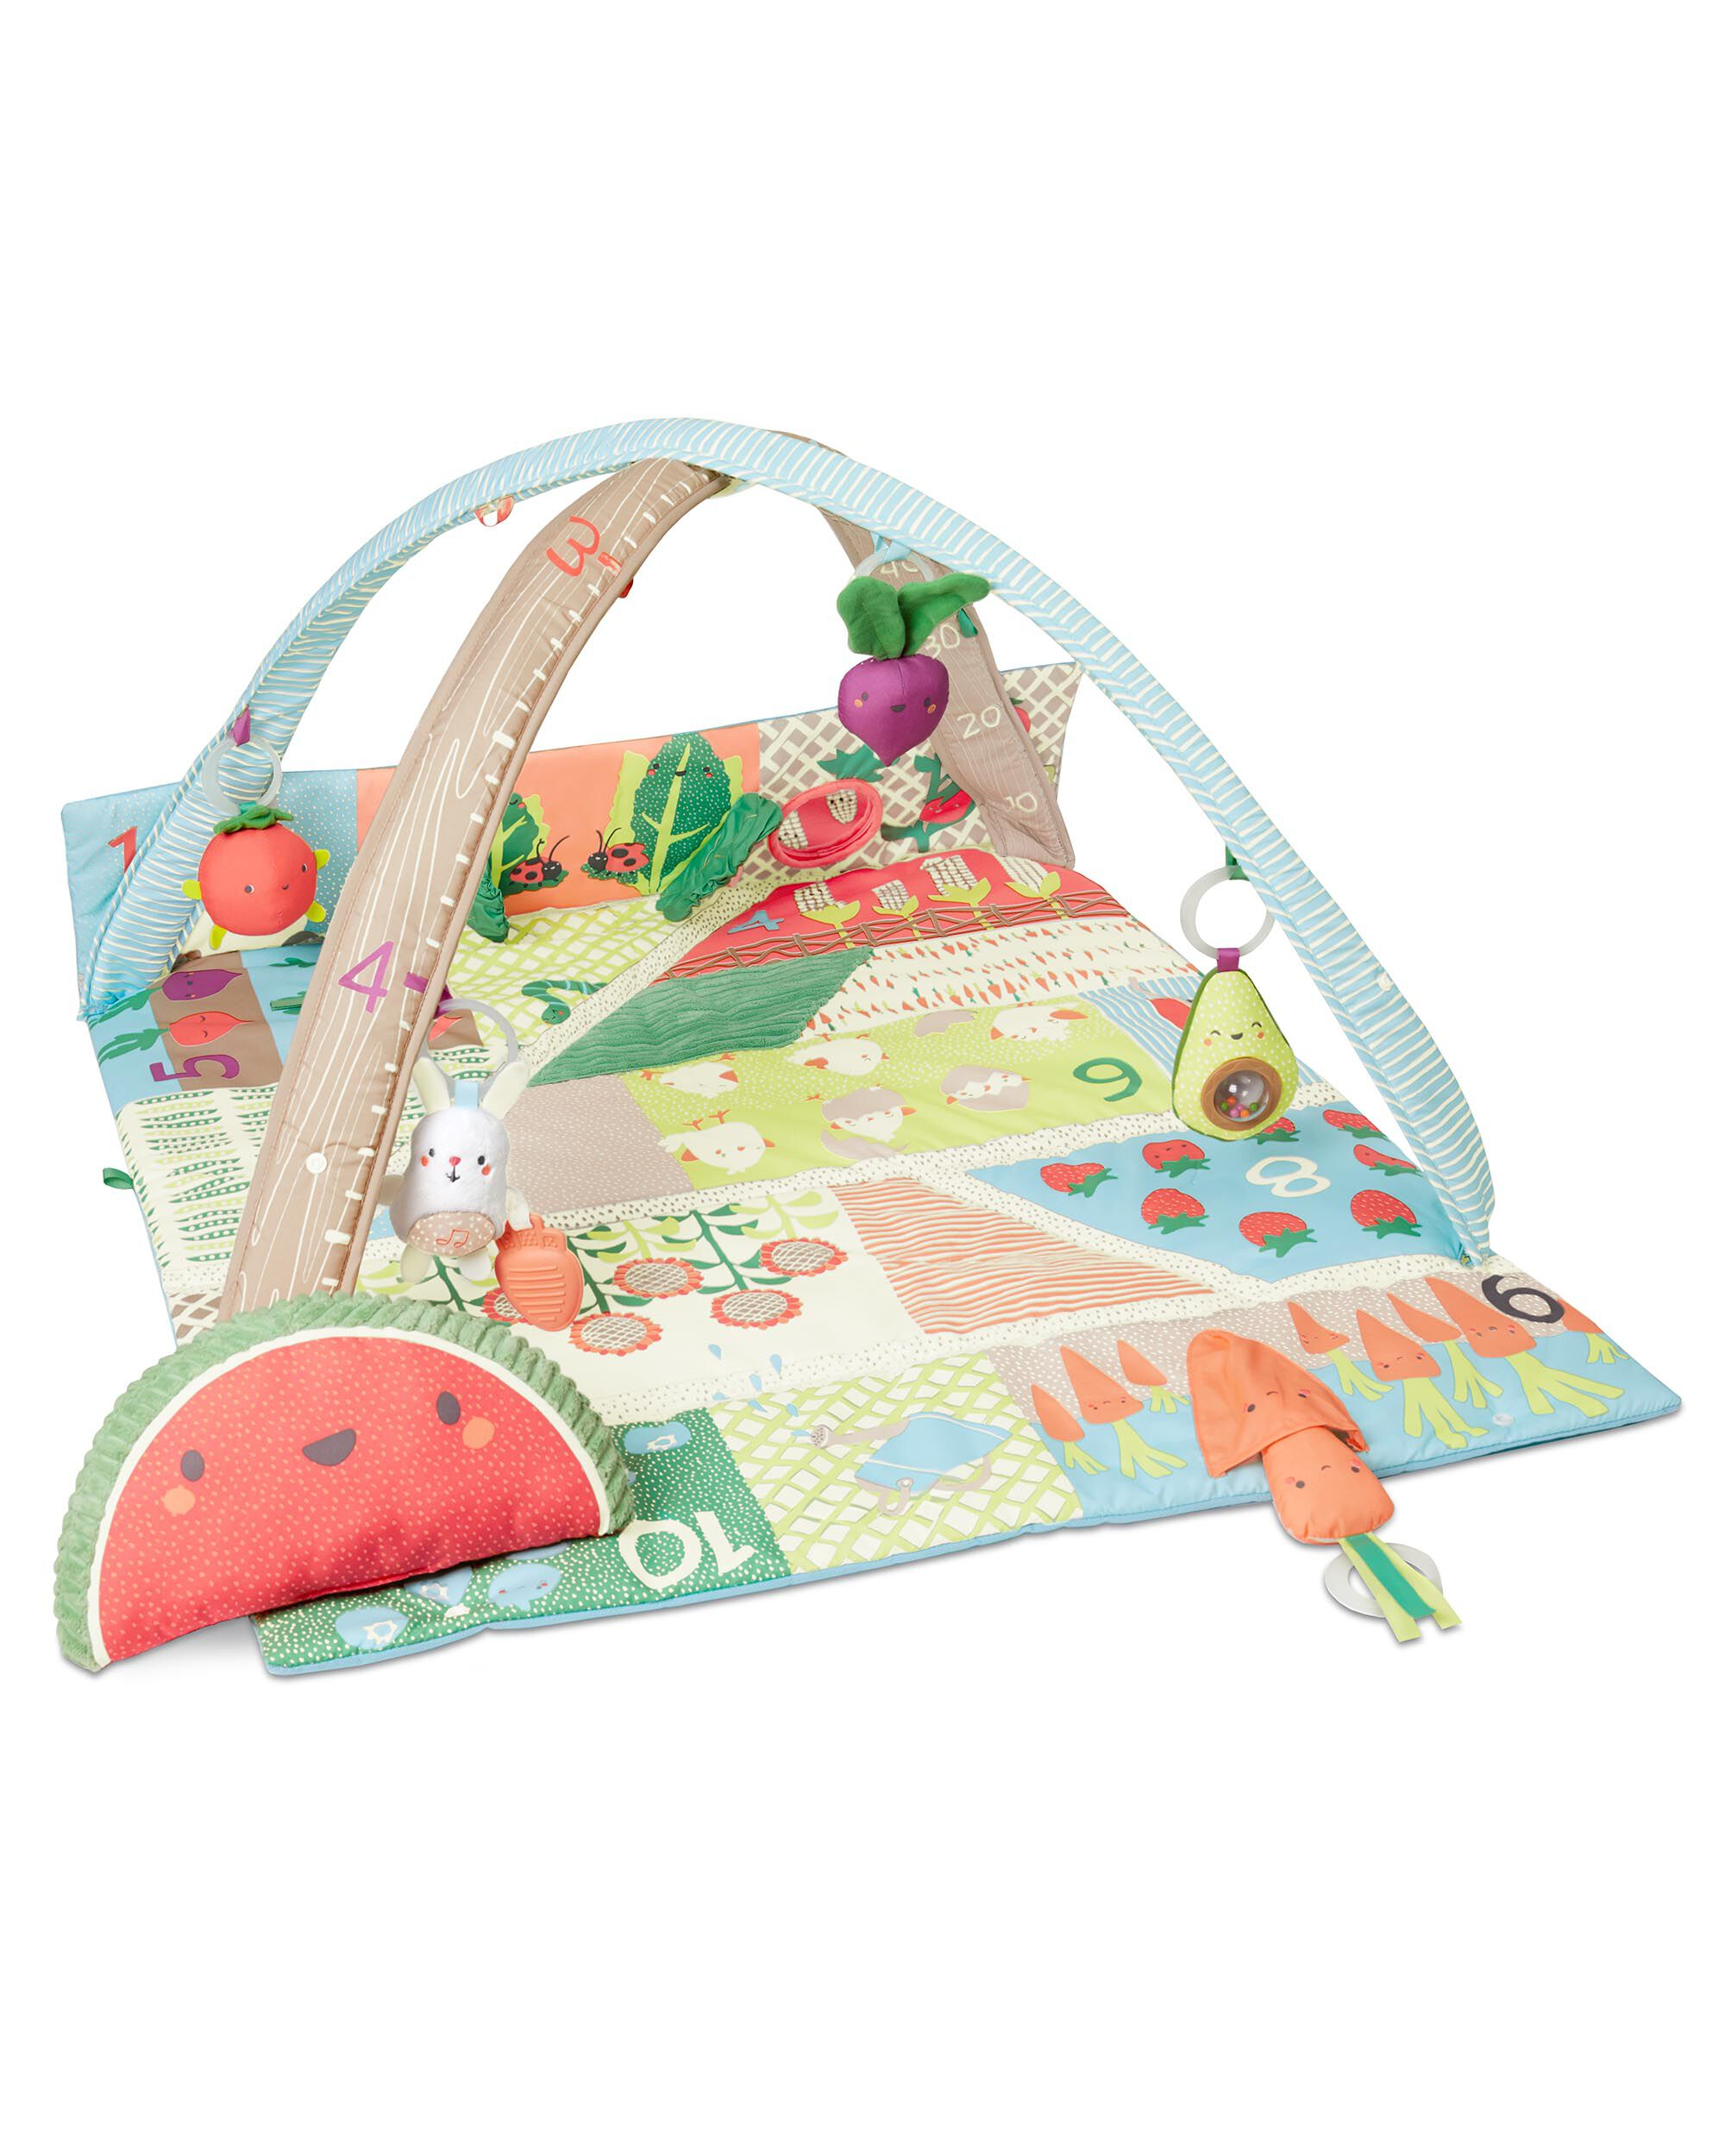 Mother & Kids Baby Frog Game Playmat Newborn Baby Gym Activity Playmat Crawling Game Mat Cartoon Floor Play Mat With Pillow Plush Toys